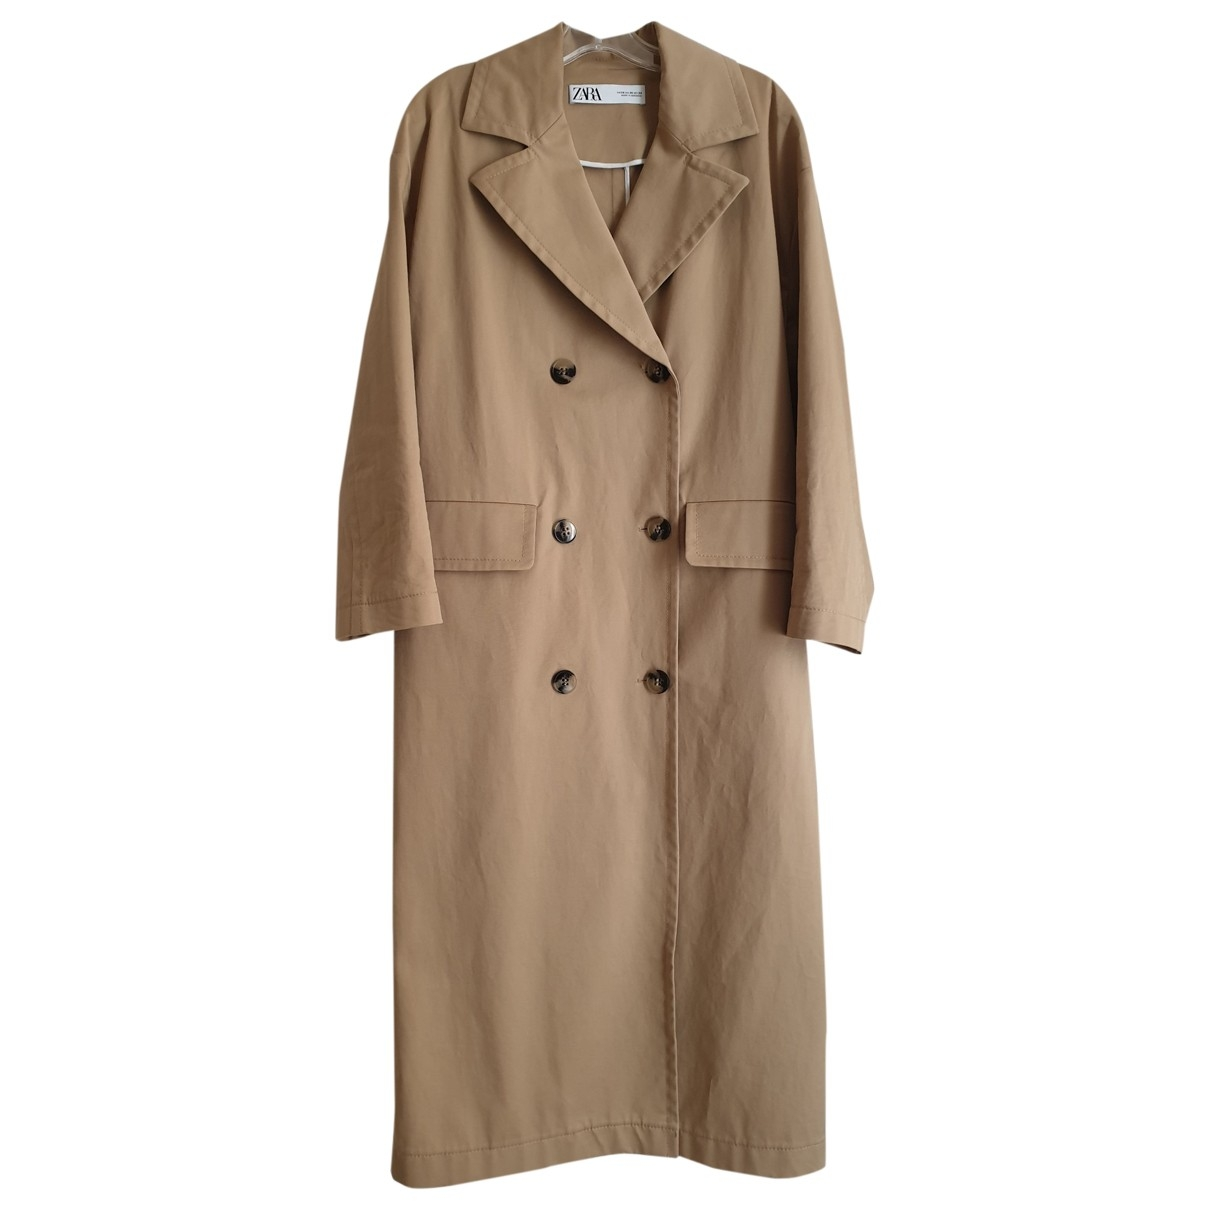 Zara \N Beige Cotton Trench coat for Women XS International